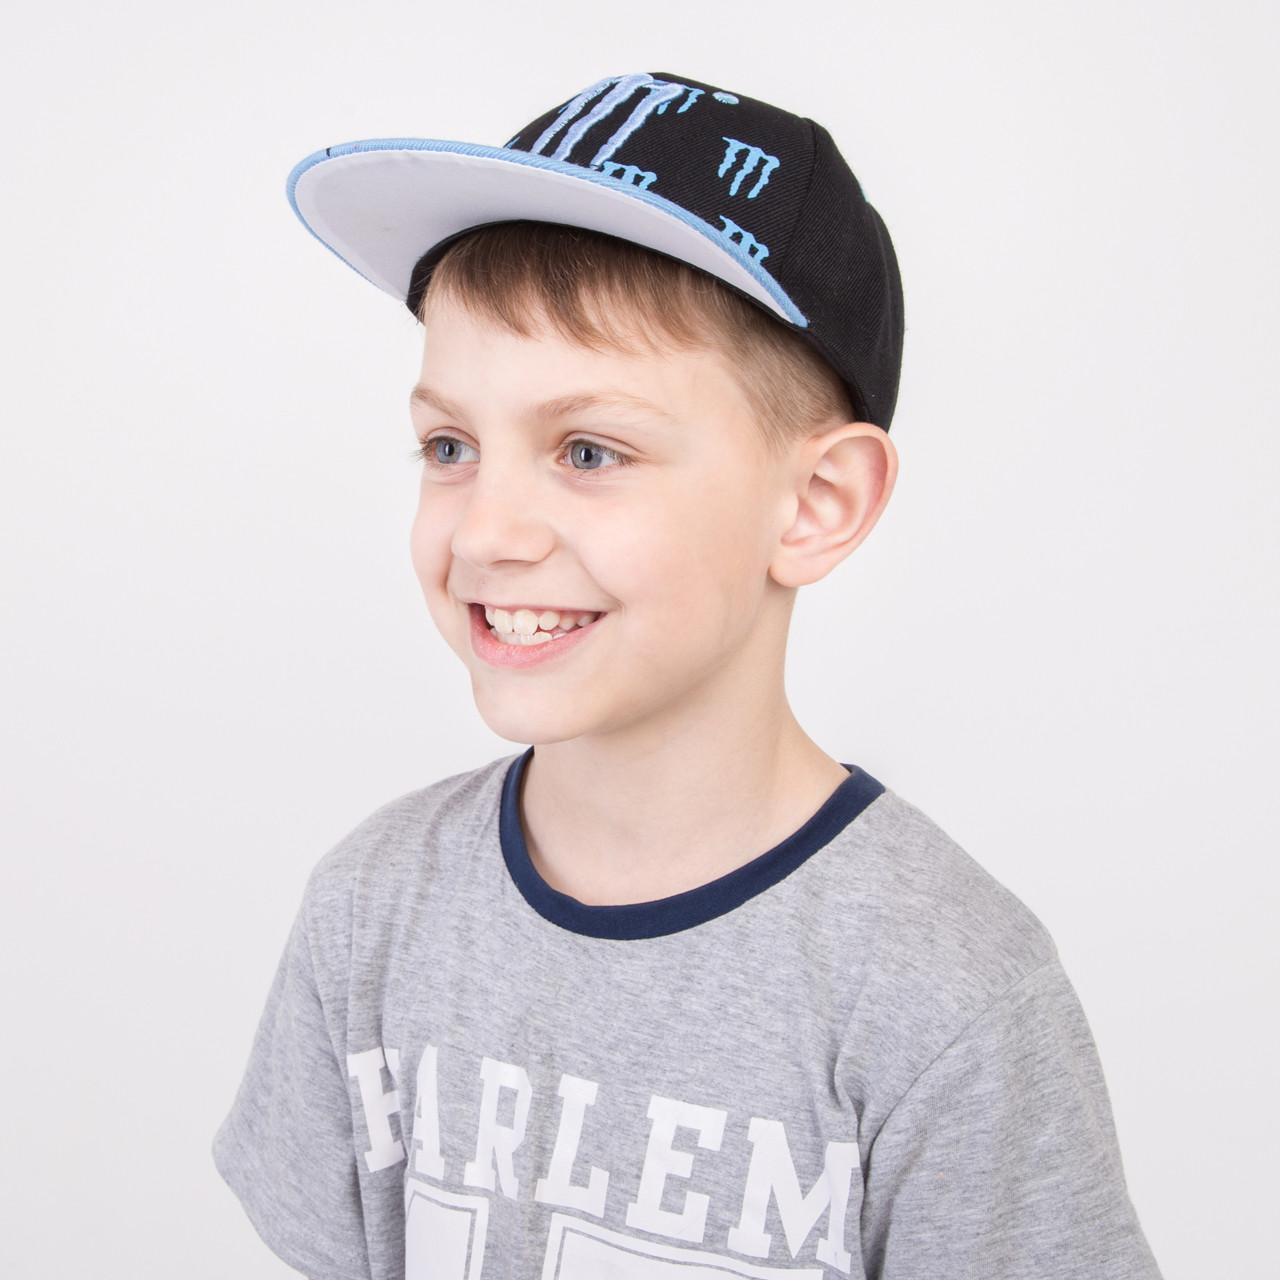 Весенняя кепка Snapback для мальчика оптом - 82018-14